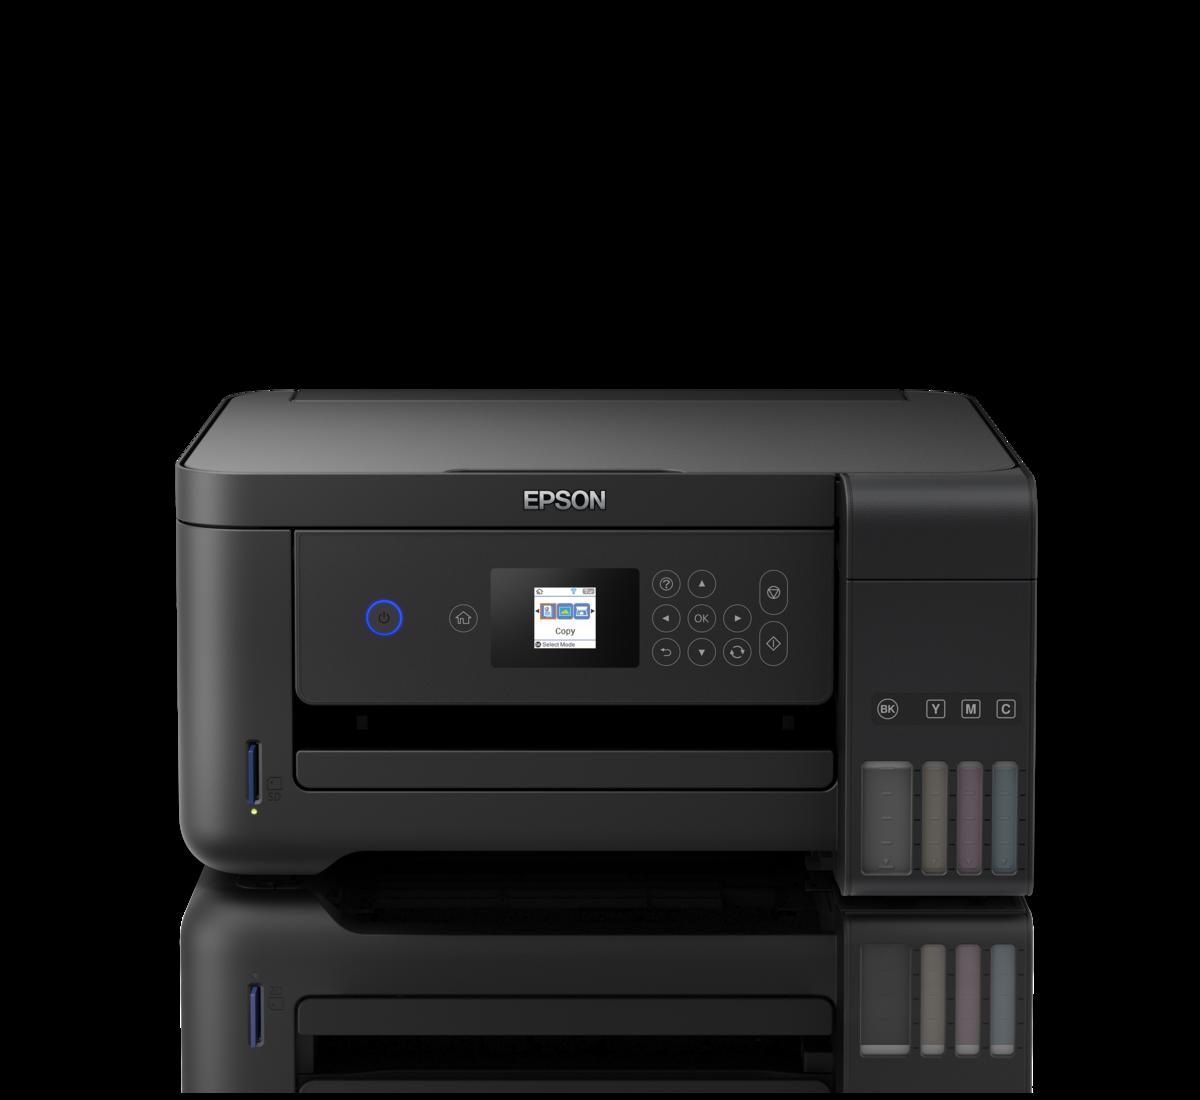 Epson L-4160 Multifunction Color Printer